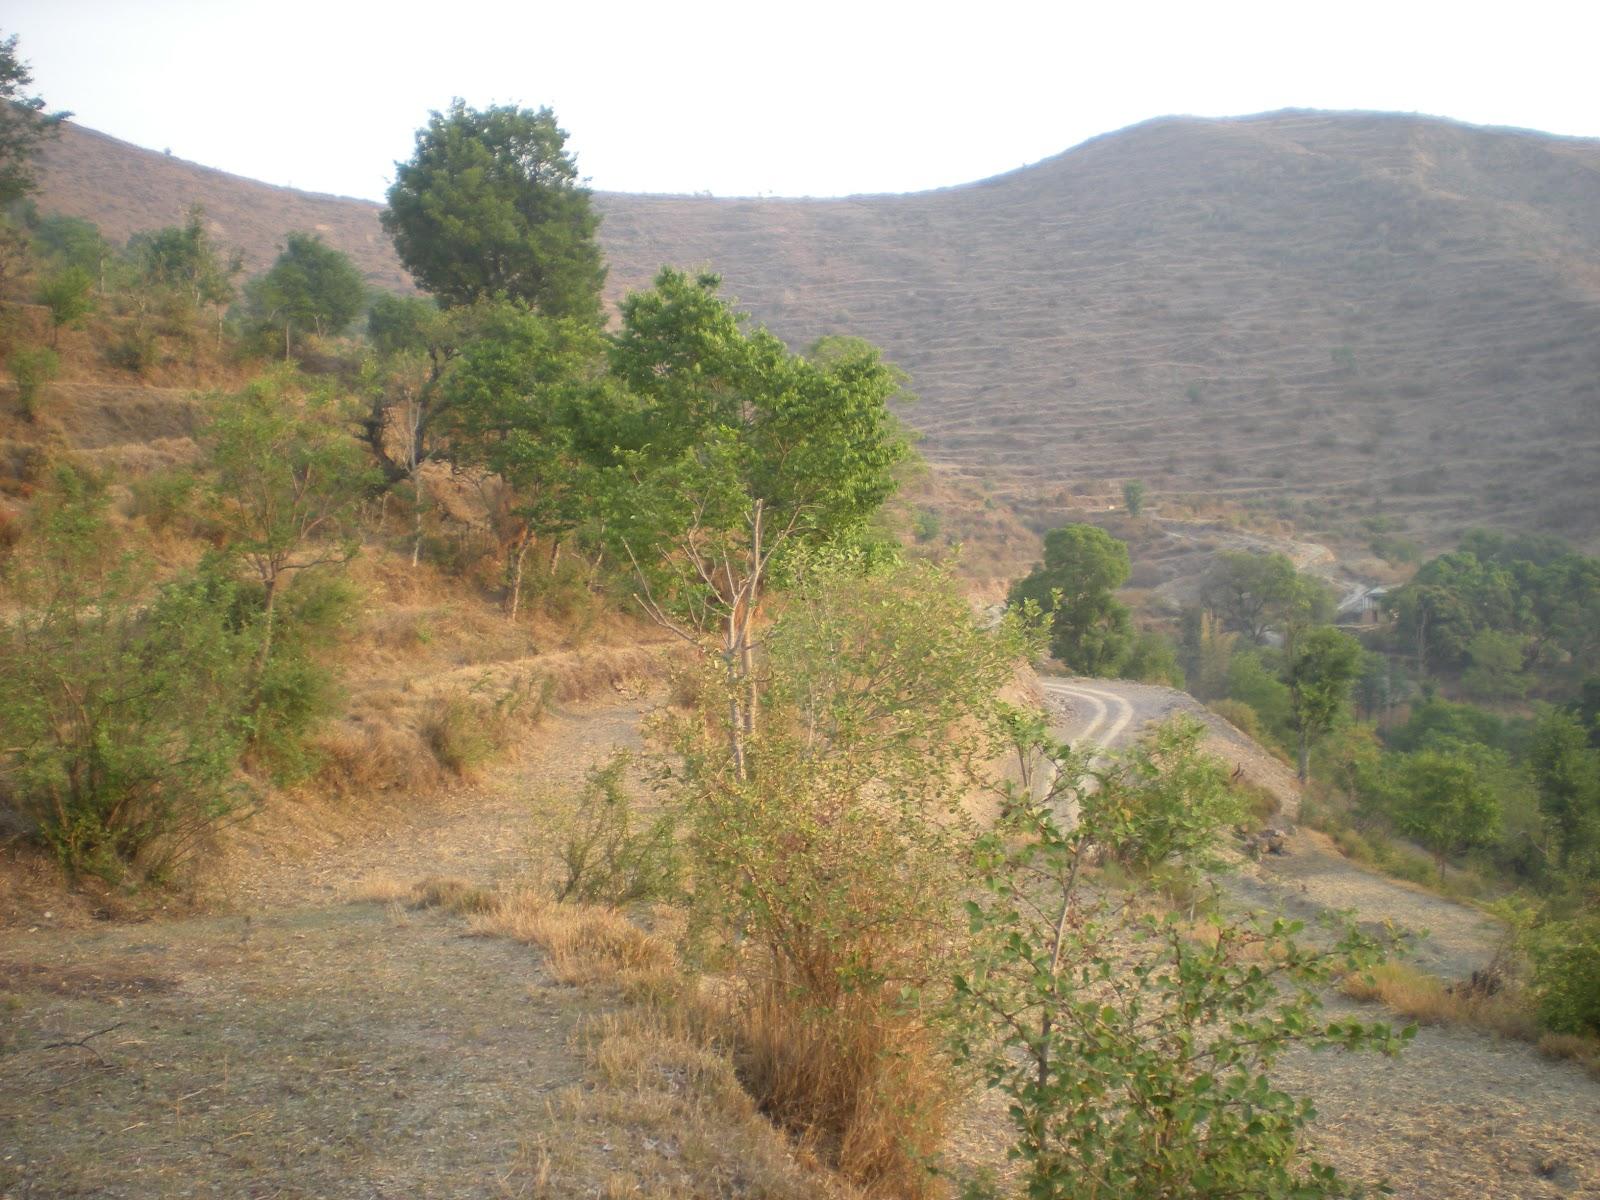 Pauri Garhwal India  city photos : TOURIST PLACE IN INDIA: Pauri Garhwal